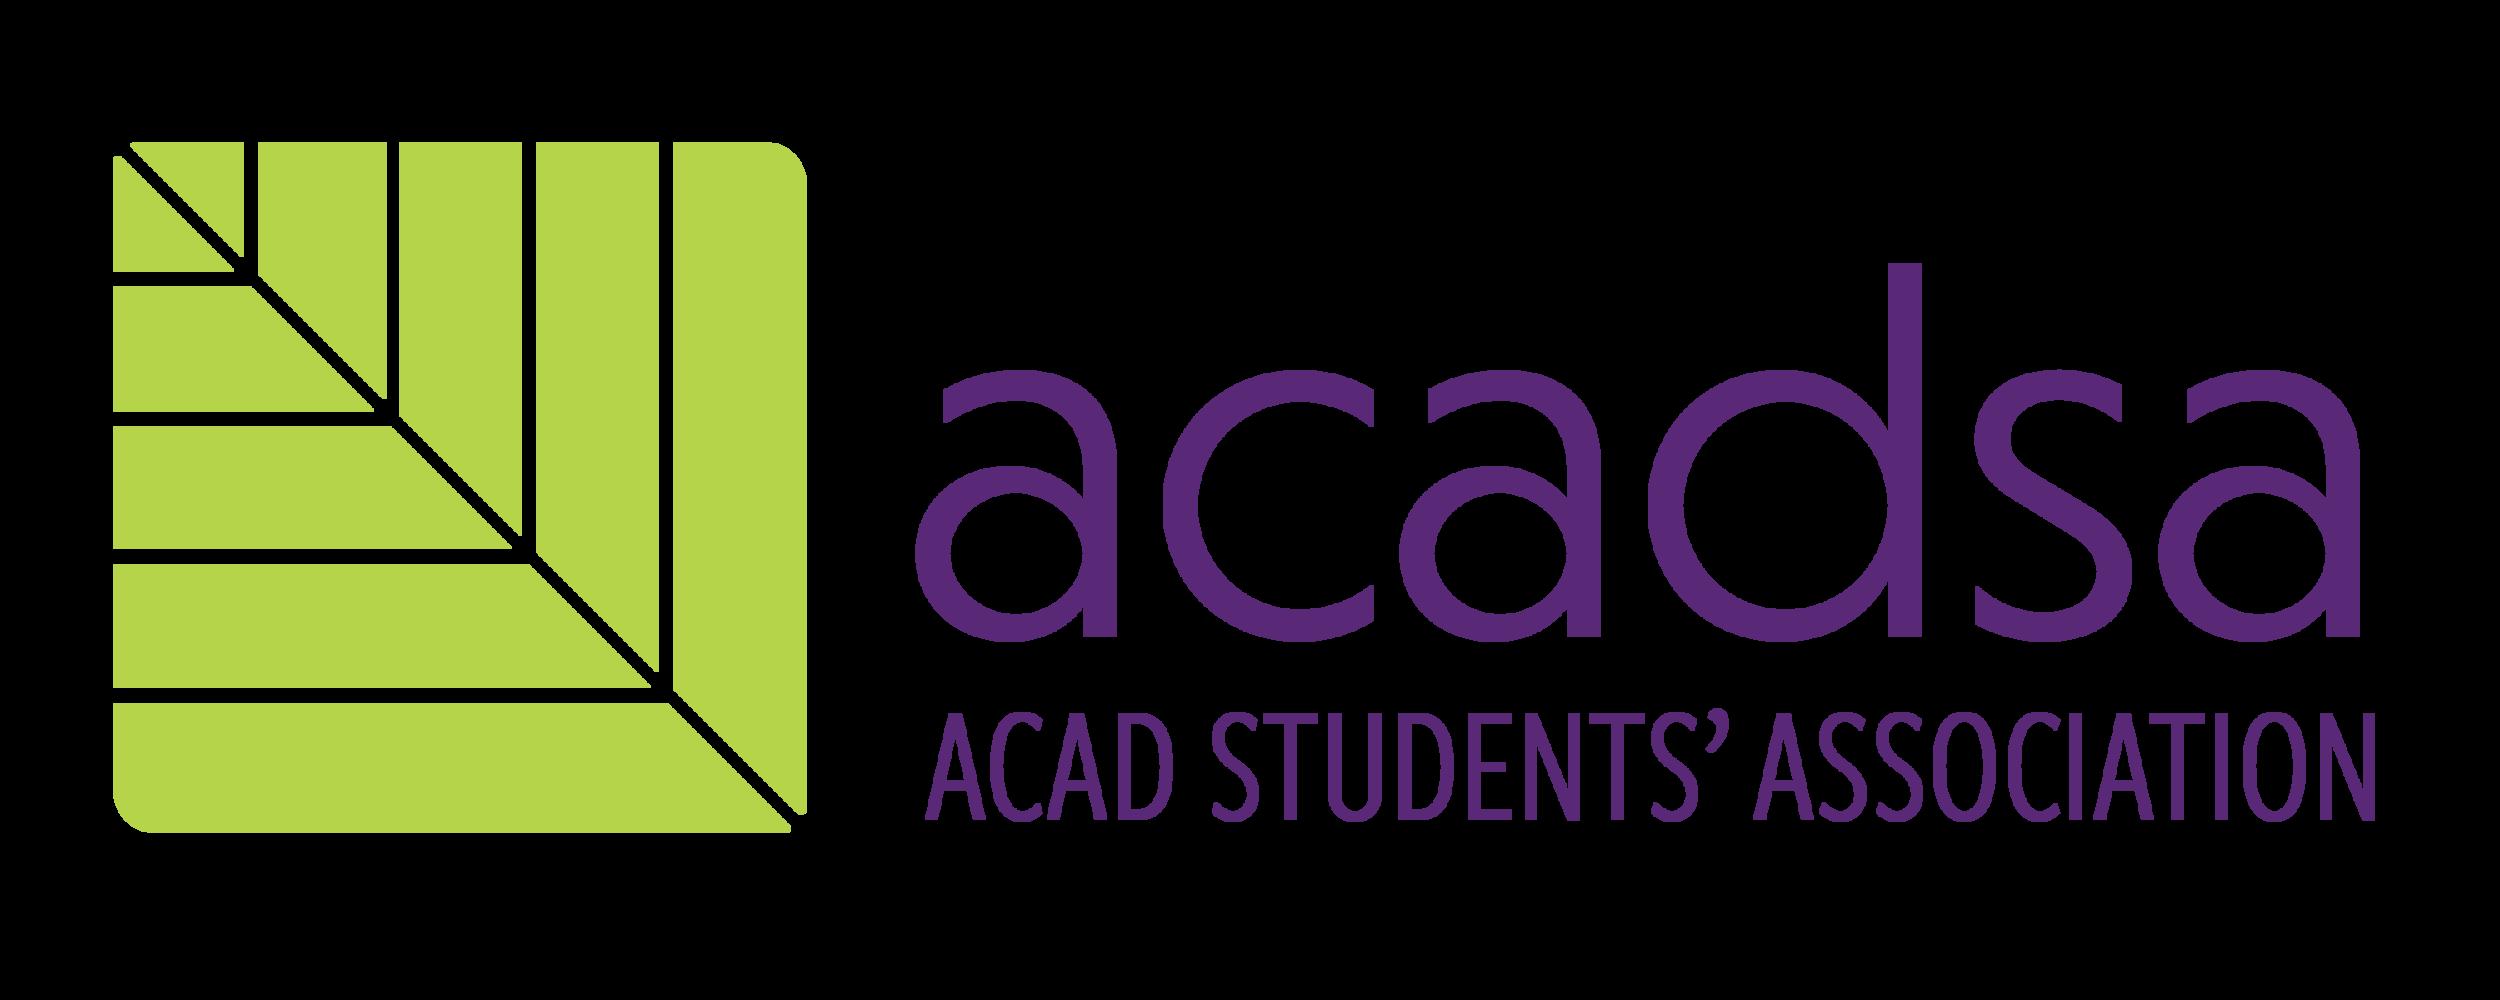 ACADSA_LogoFinal.png